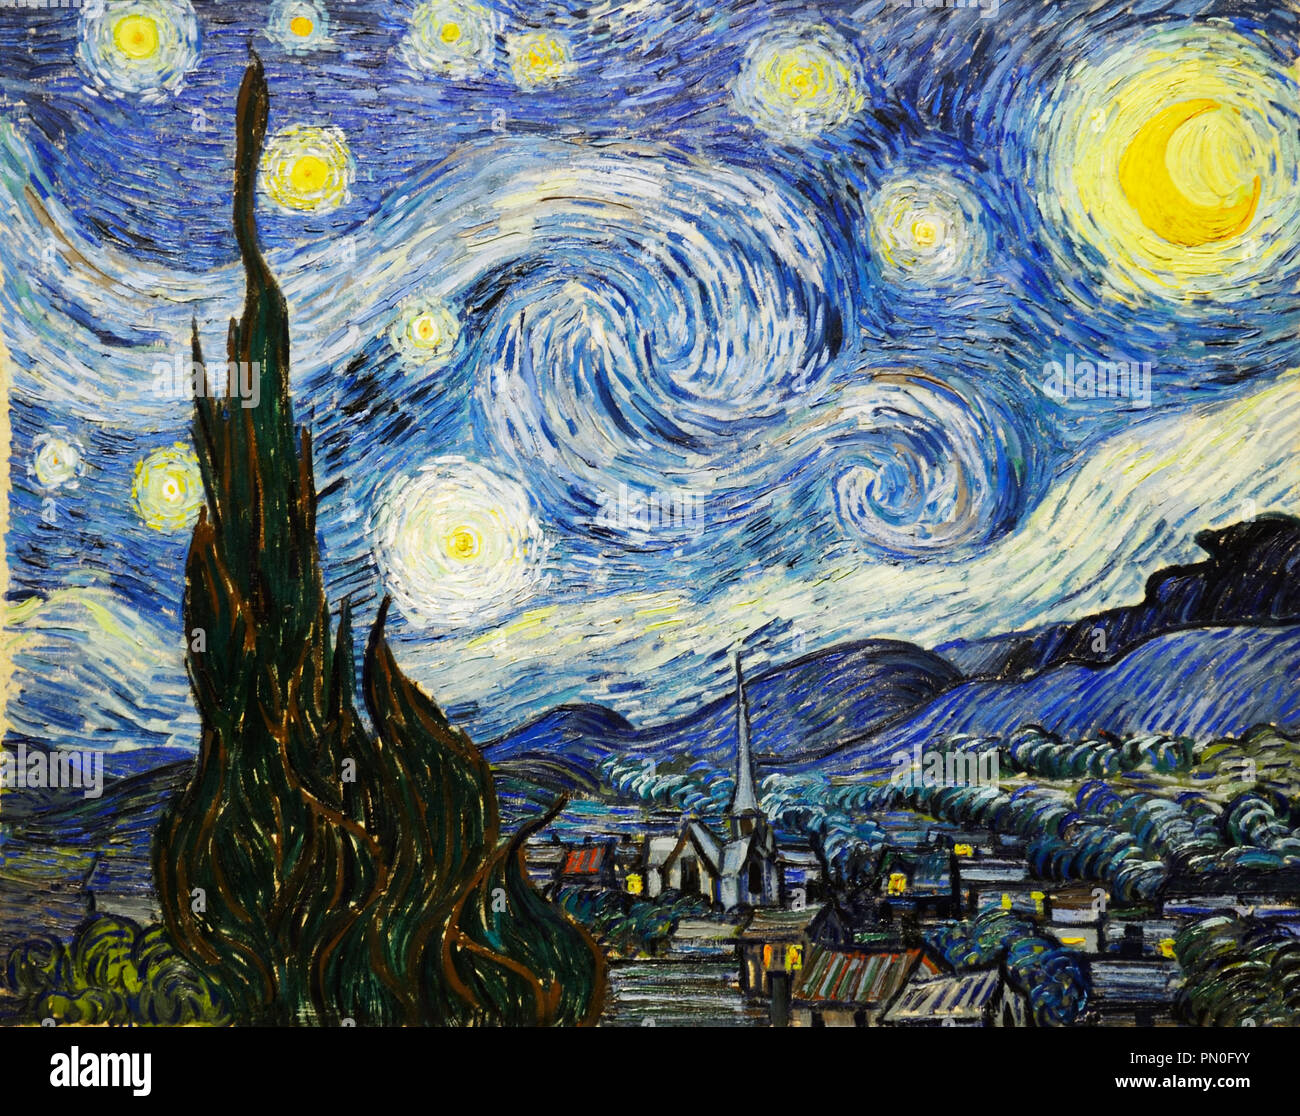 The Starry Night, Van Gogh, 1889 - Stock Image